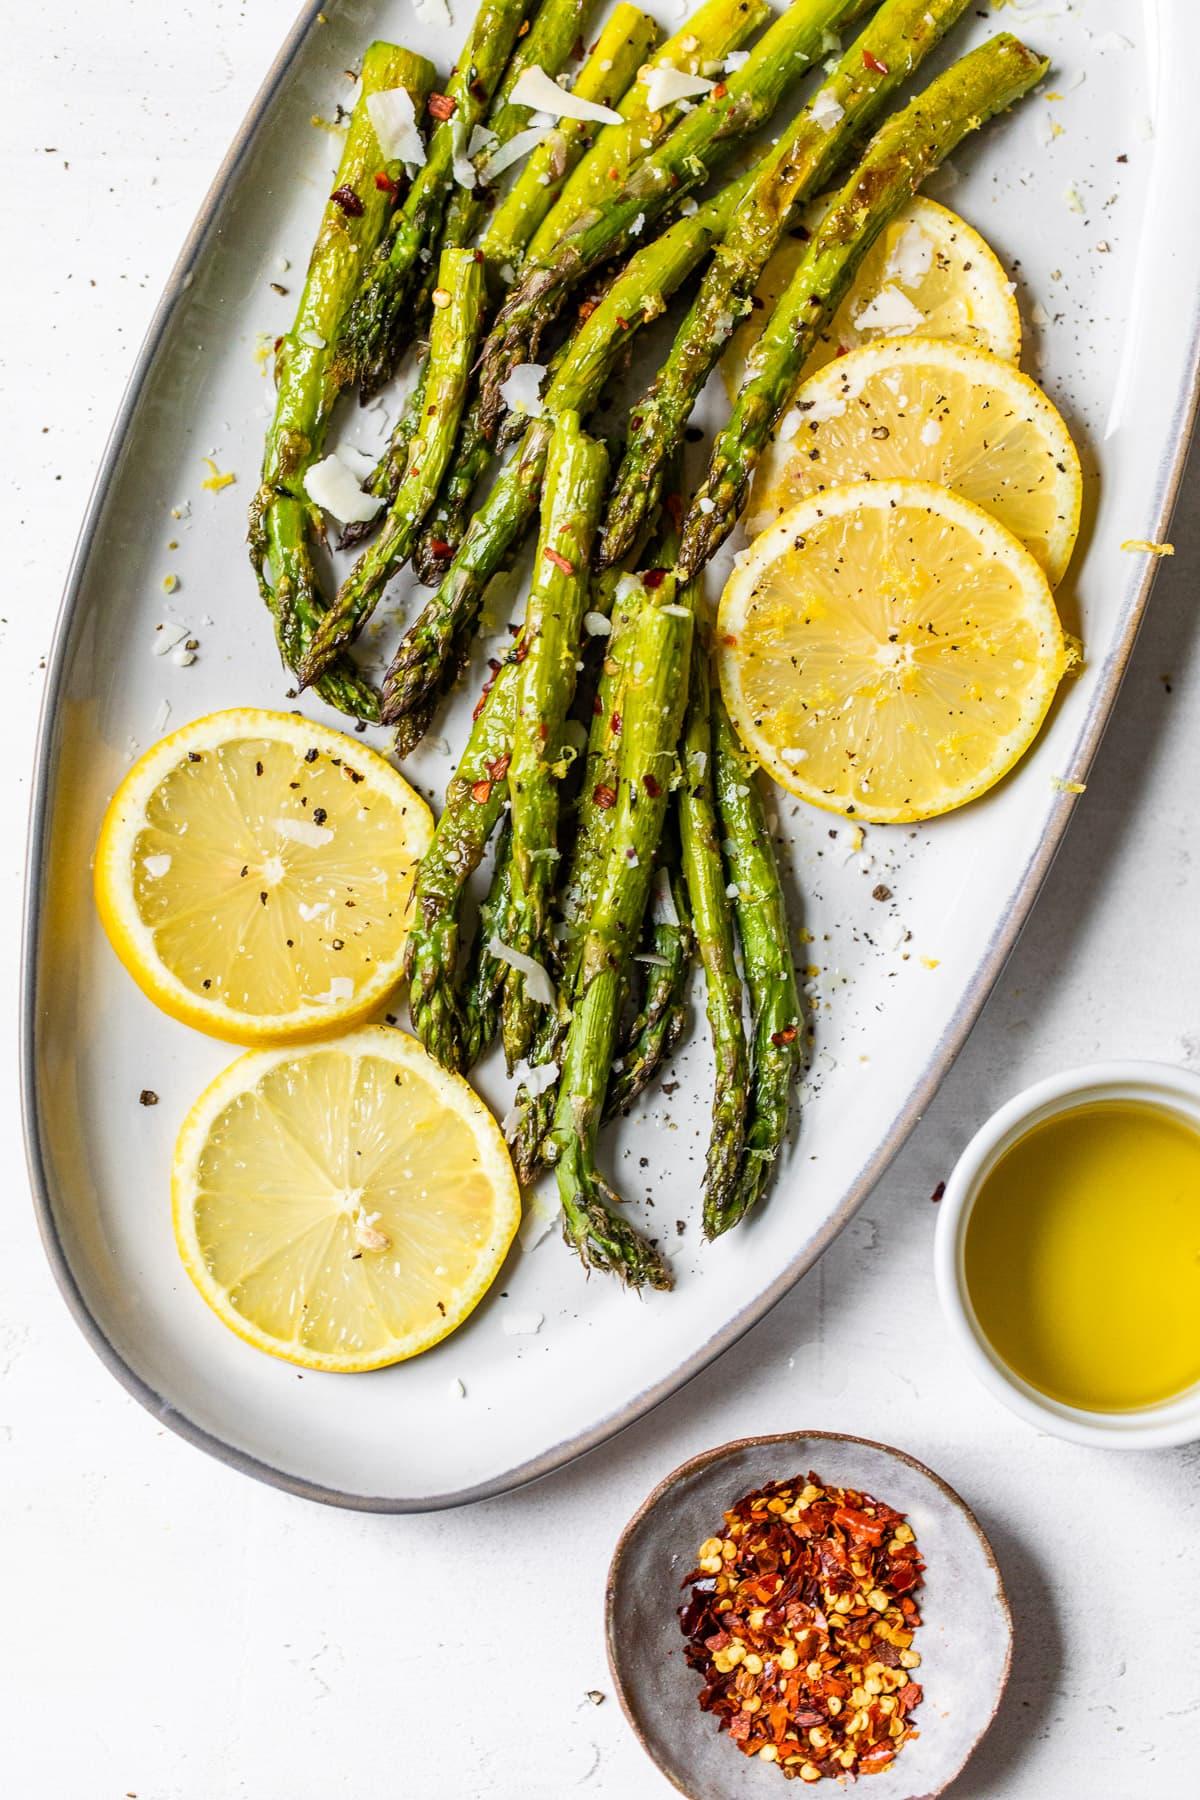 Lemon slices and roasted asparagus